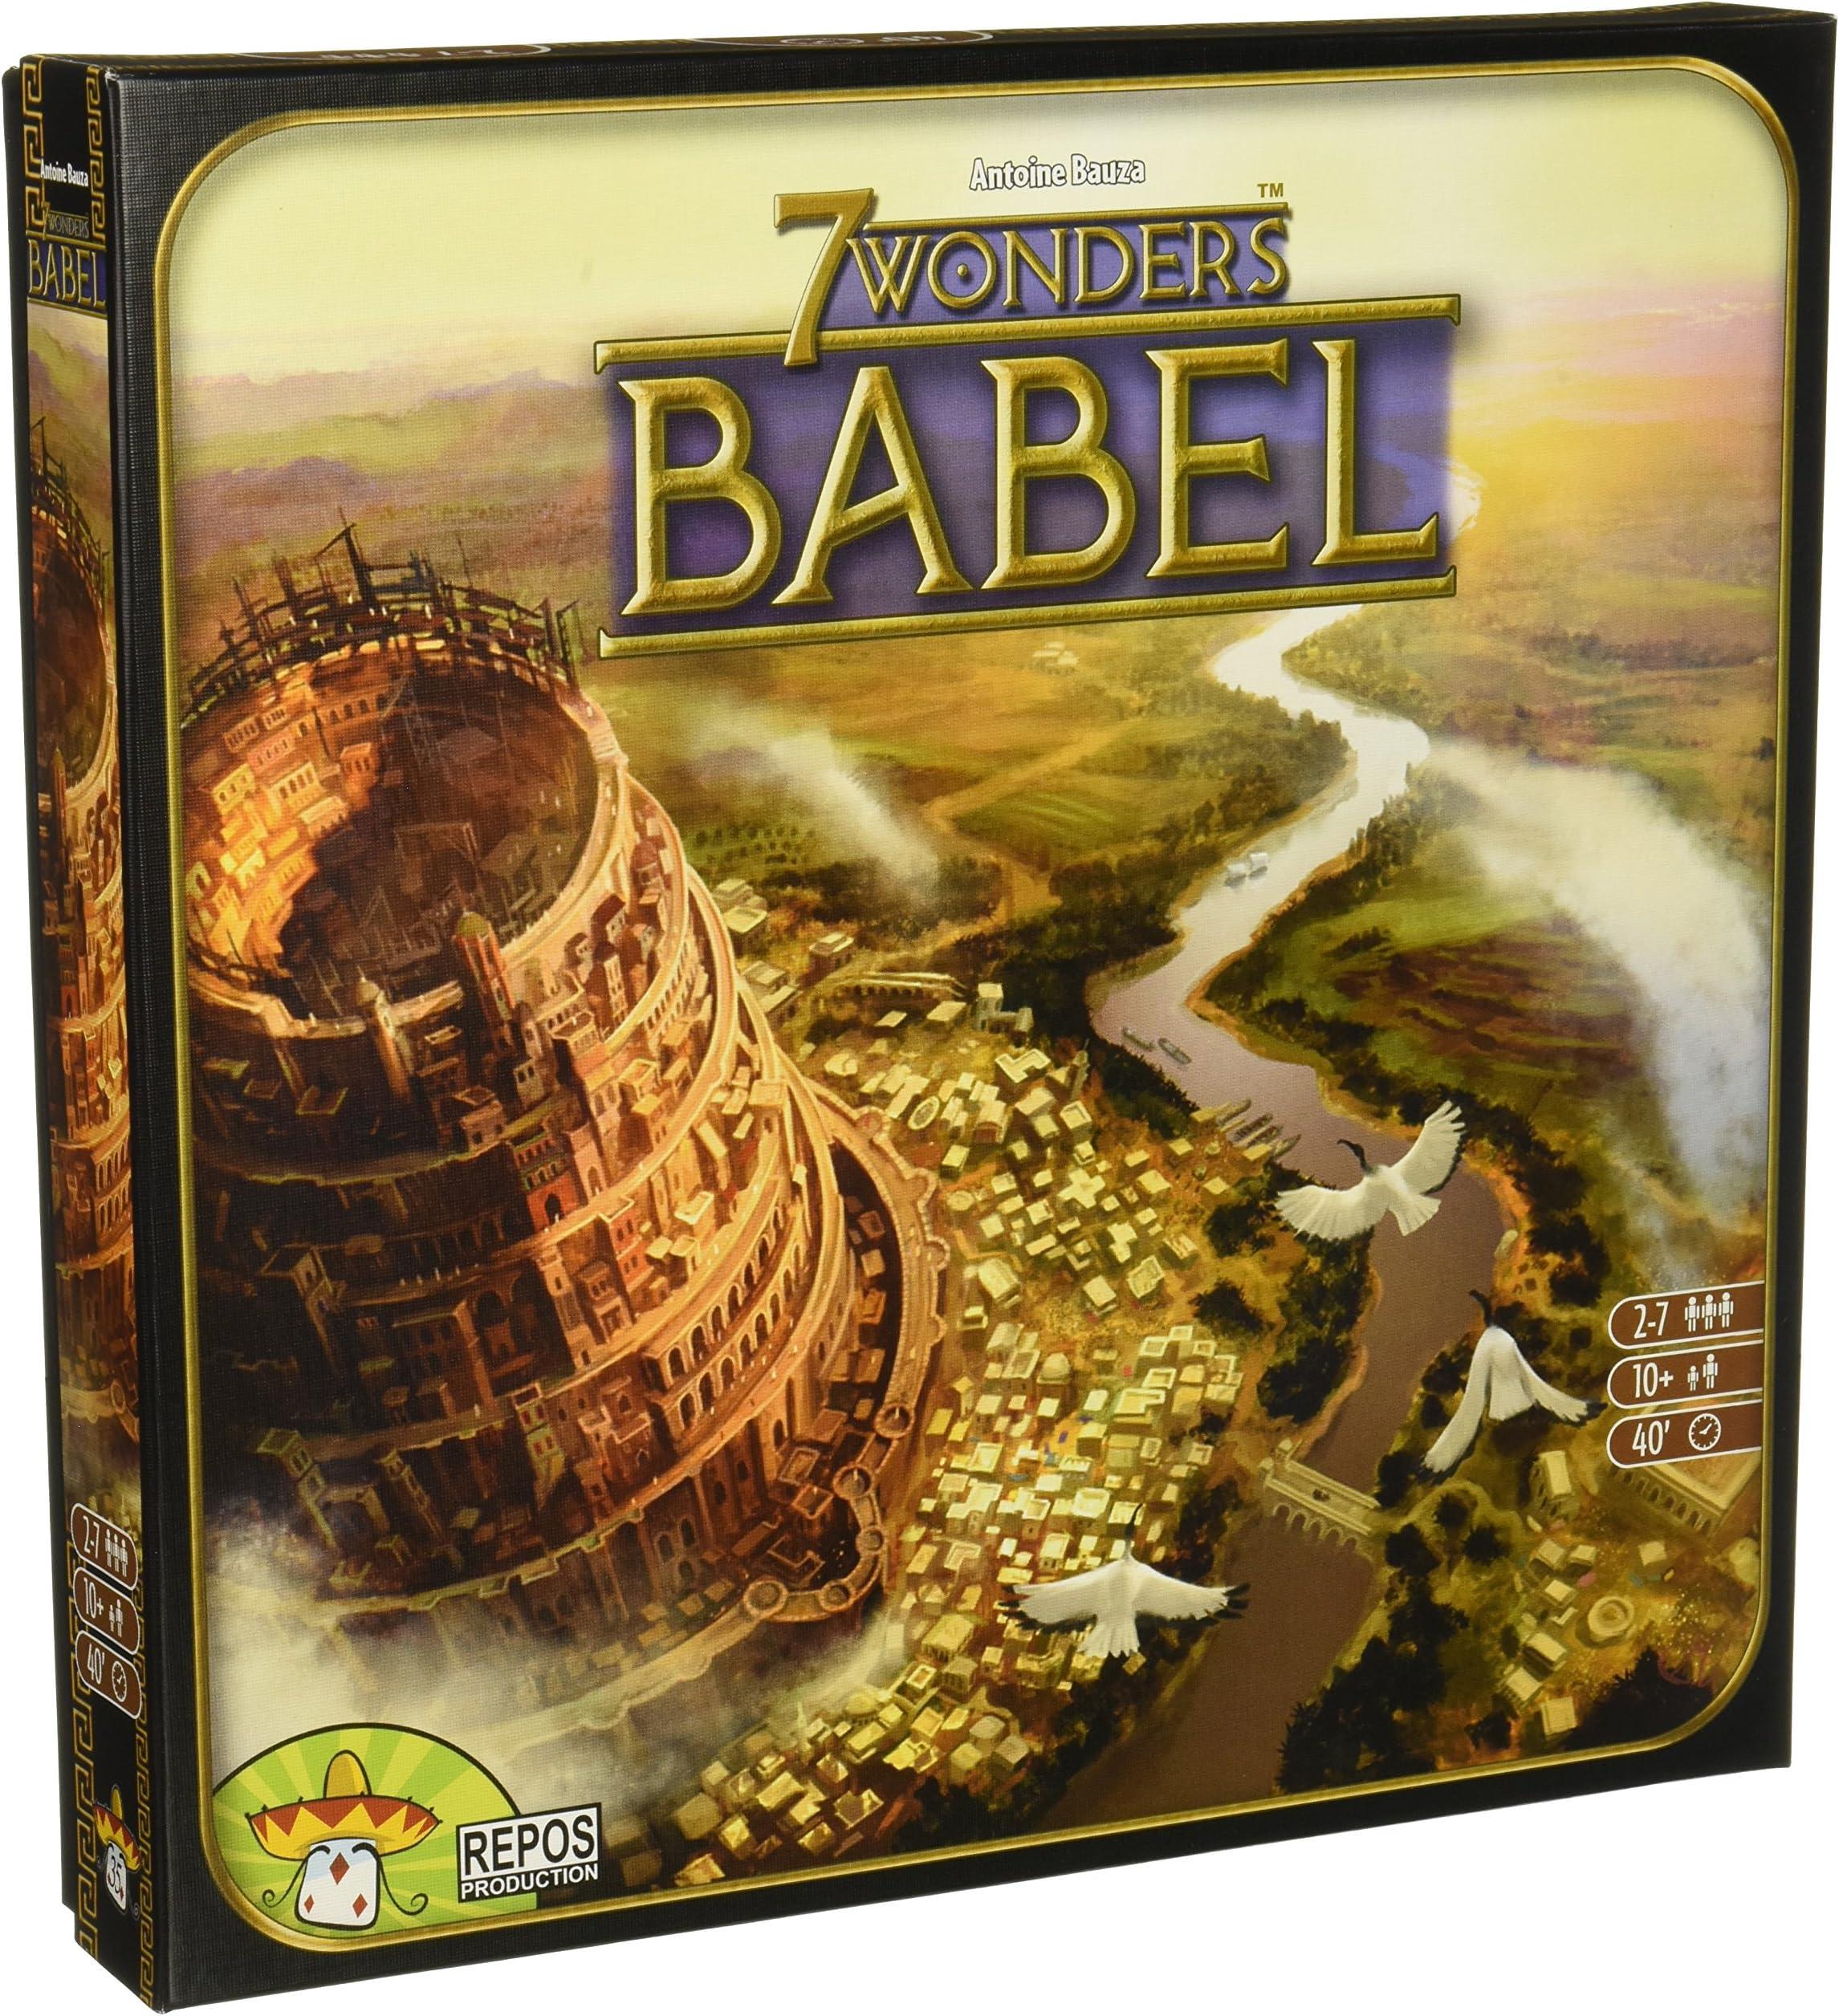 7 Wonders: Babel Expansion